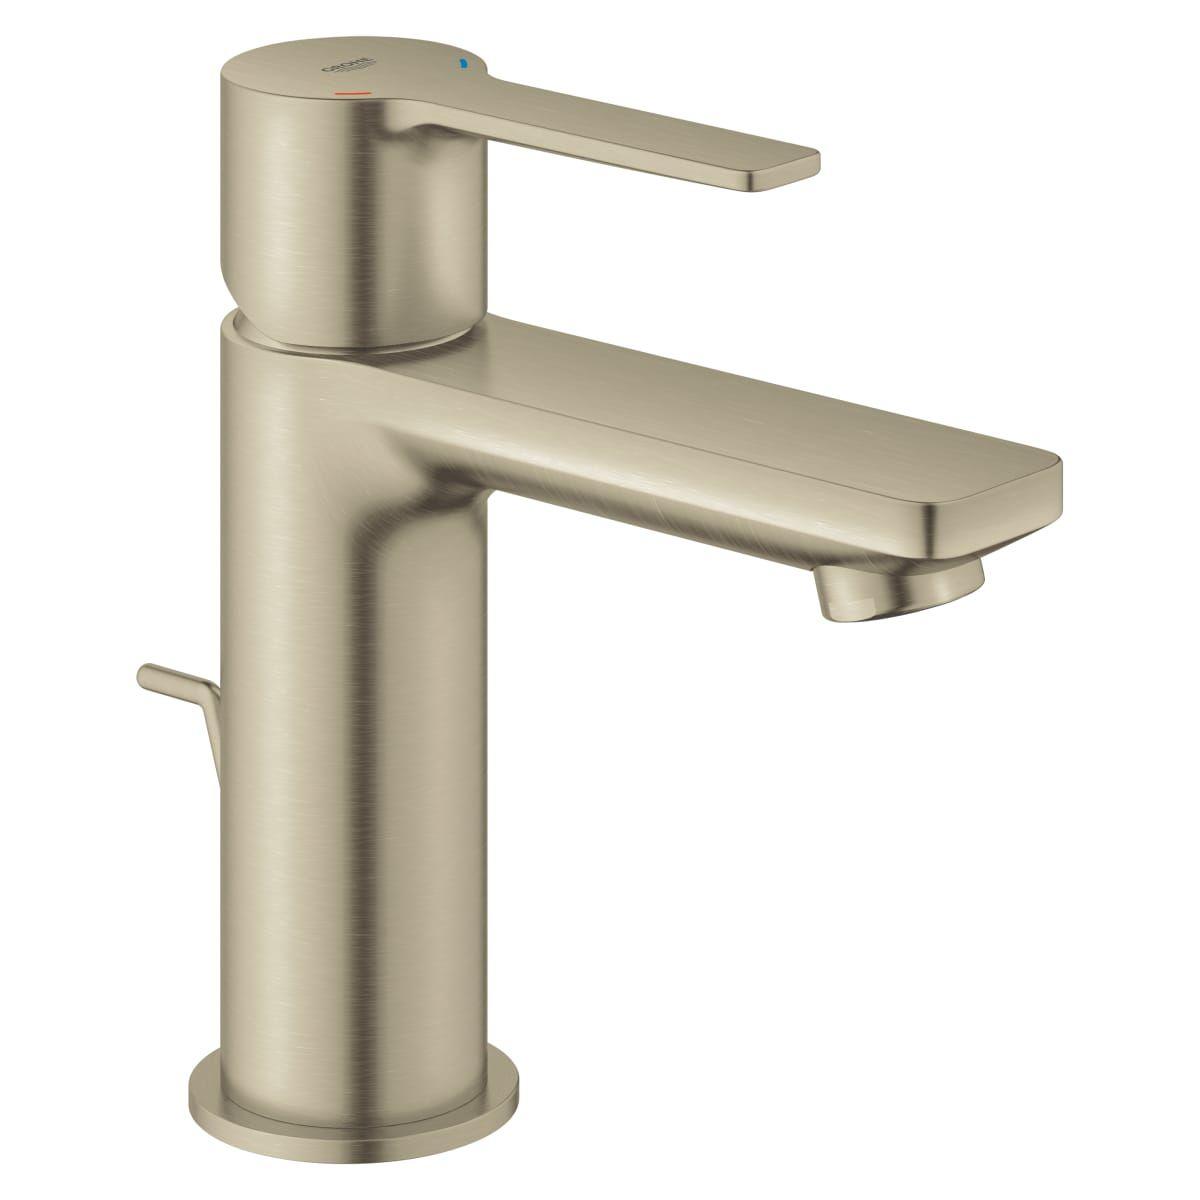 Grohe 23824ena Lineare 1 2 Gpm Deck Mounted Build Com Bathroom Faucets Single Handle Bathroom Faucet Single Hole Bathroom Faucet [ 1200 x 1200 Pixel ]